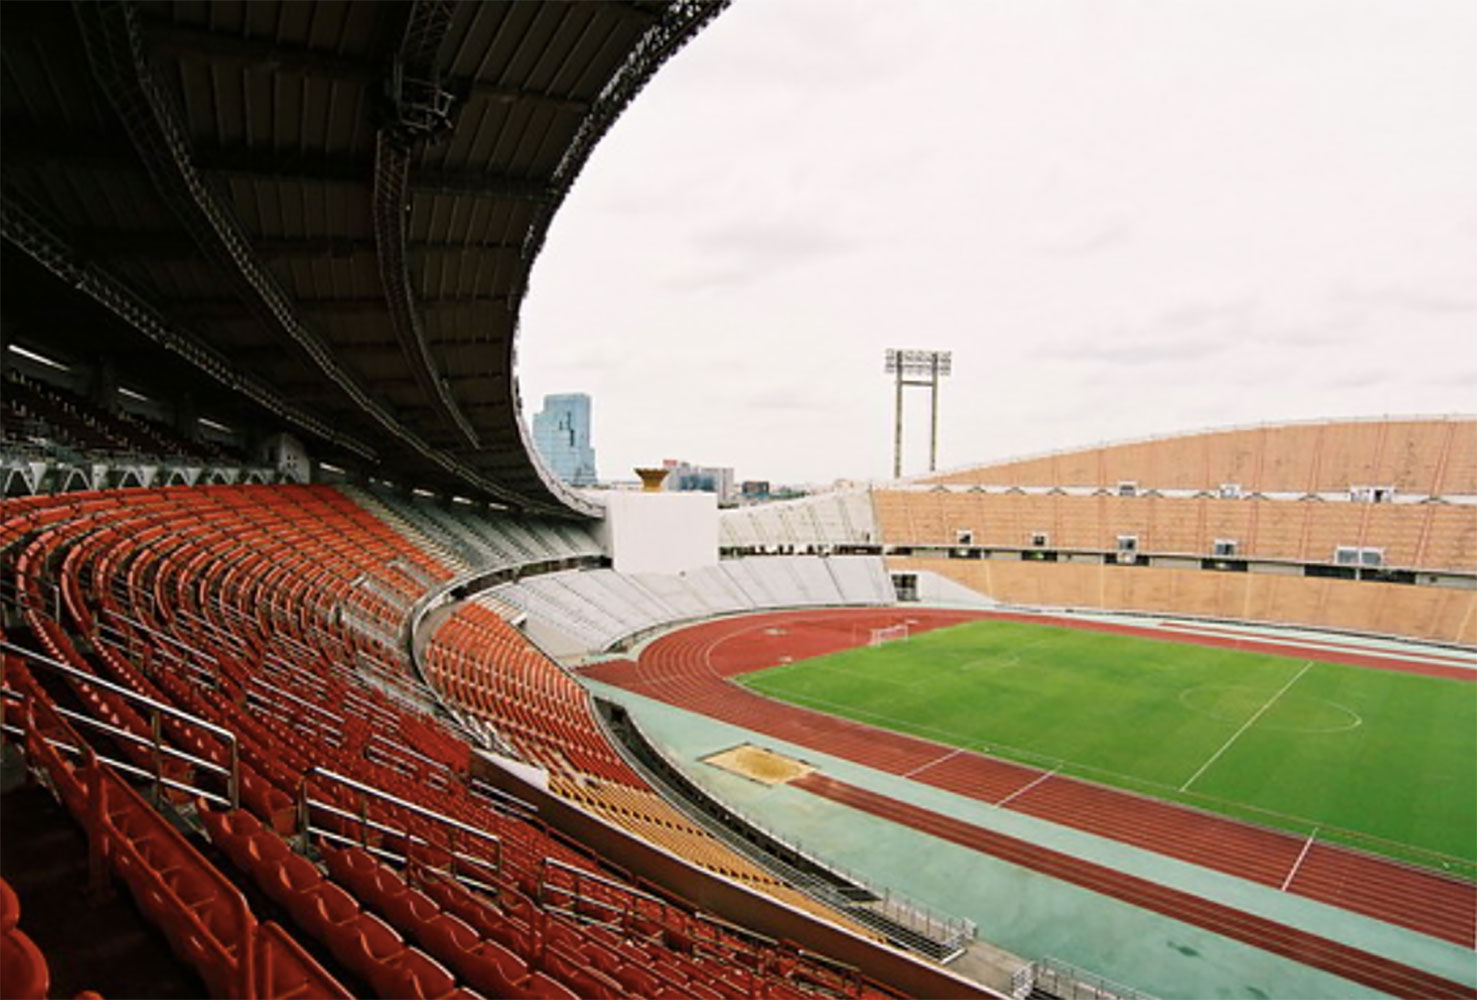 Sports stadium filming location in Bangkok Thailand